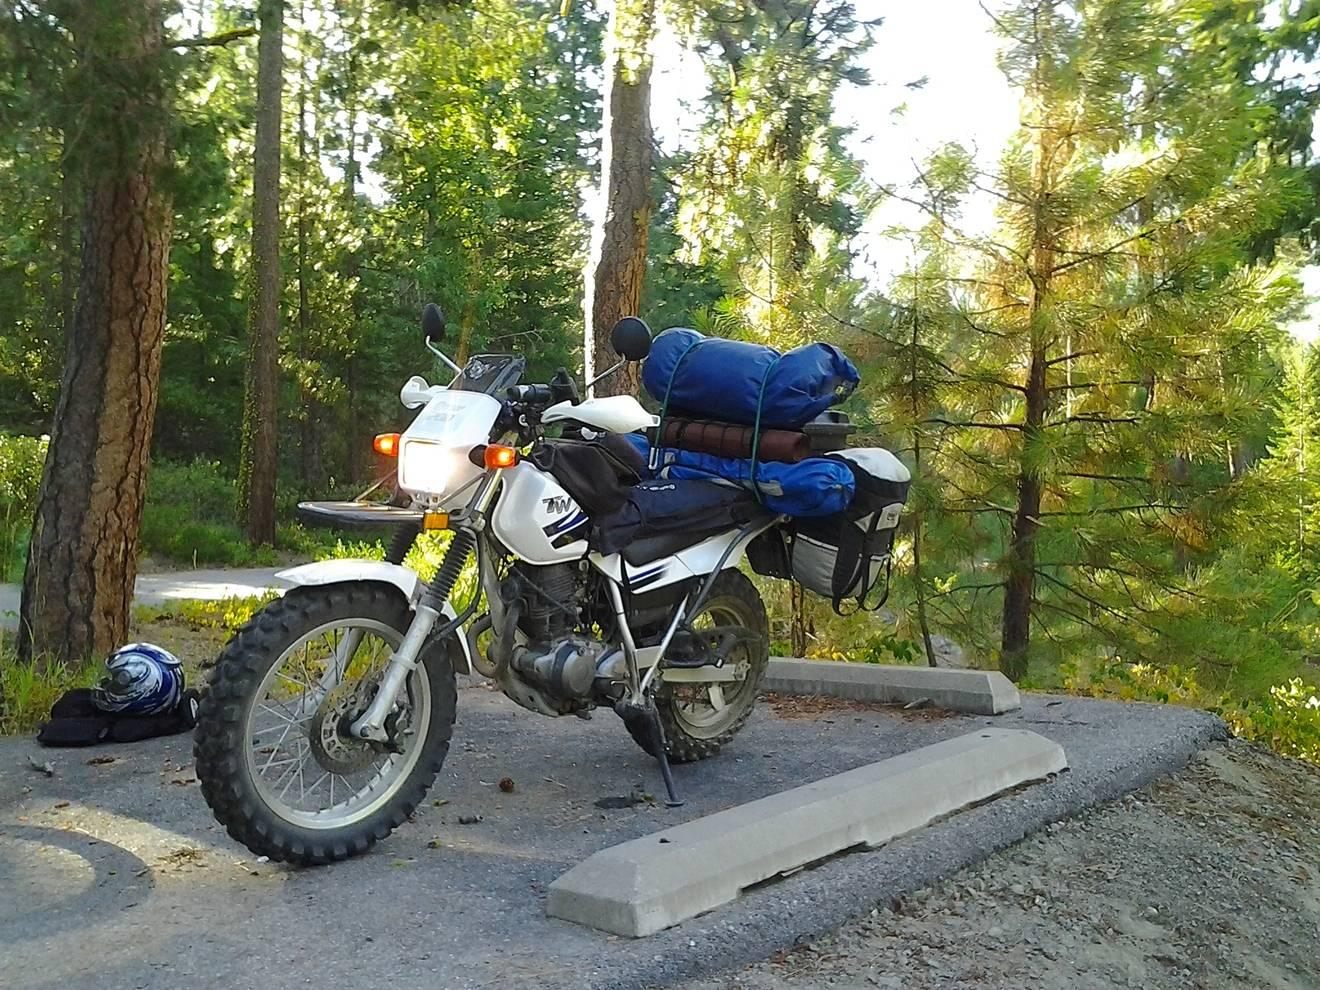 2012 birthday weekend ride 0818120834